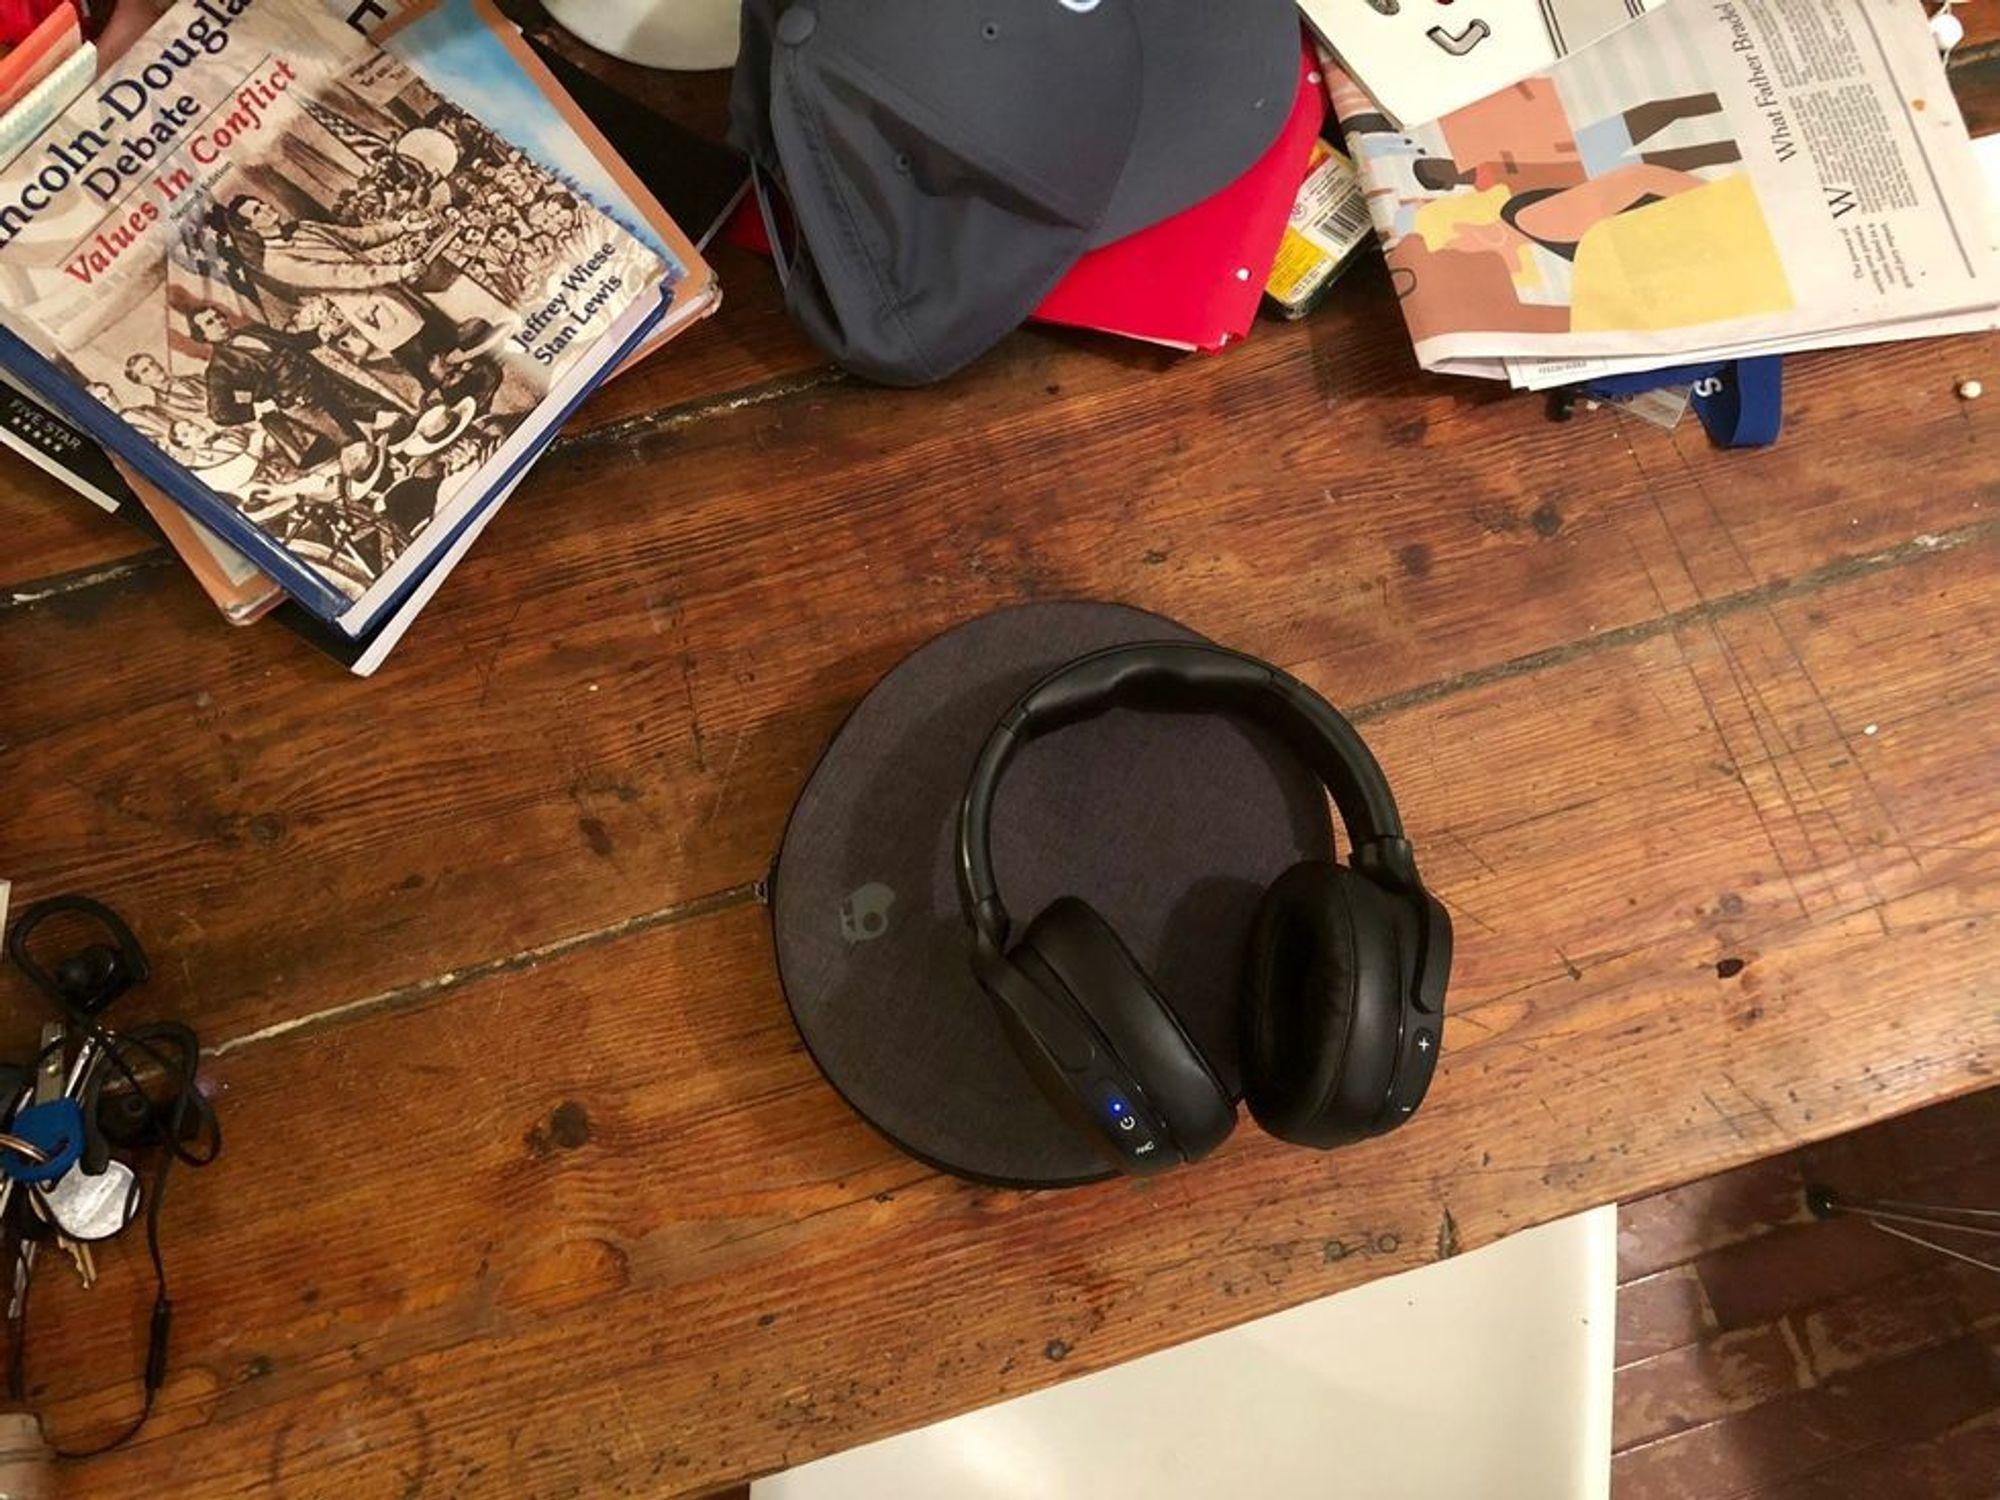 Skullcandy Venue wireless headphones review: High end